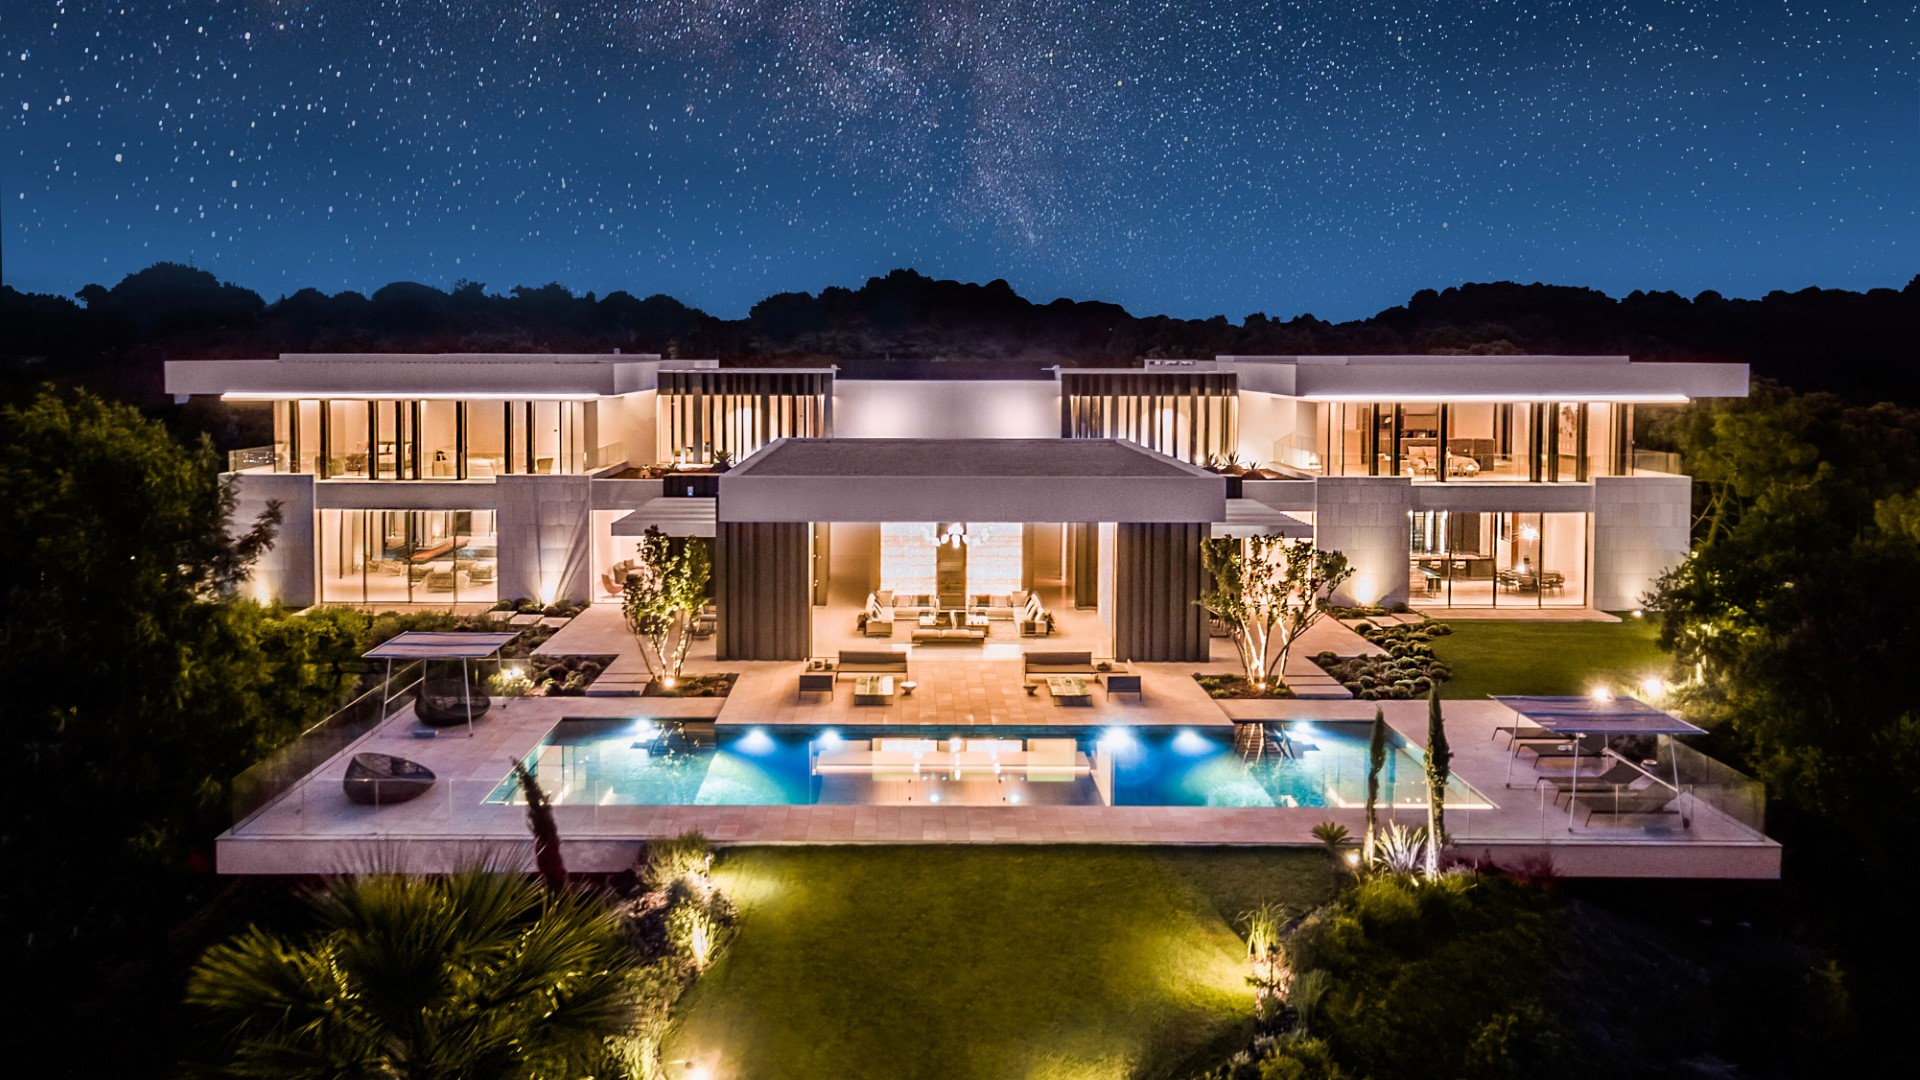 Most Luxury Villla in Marbella